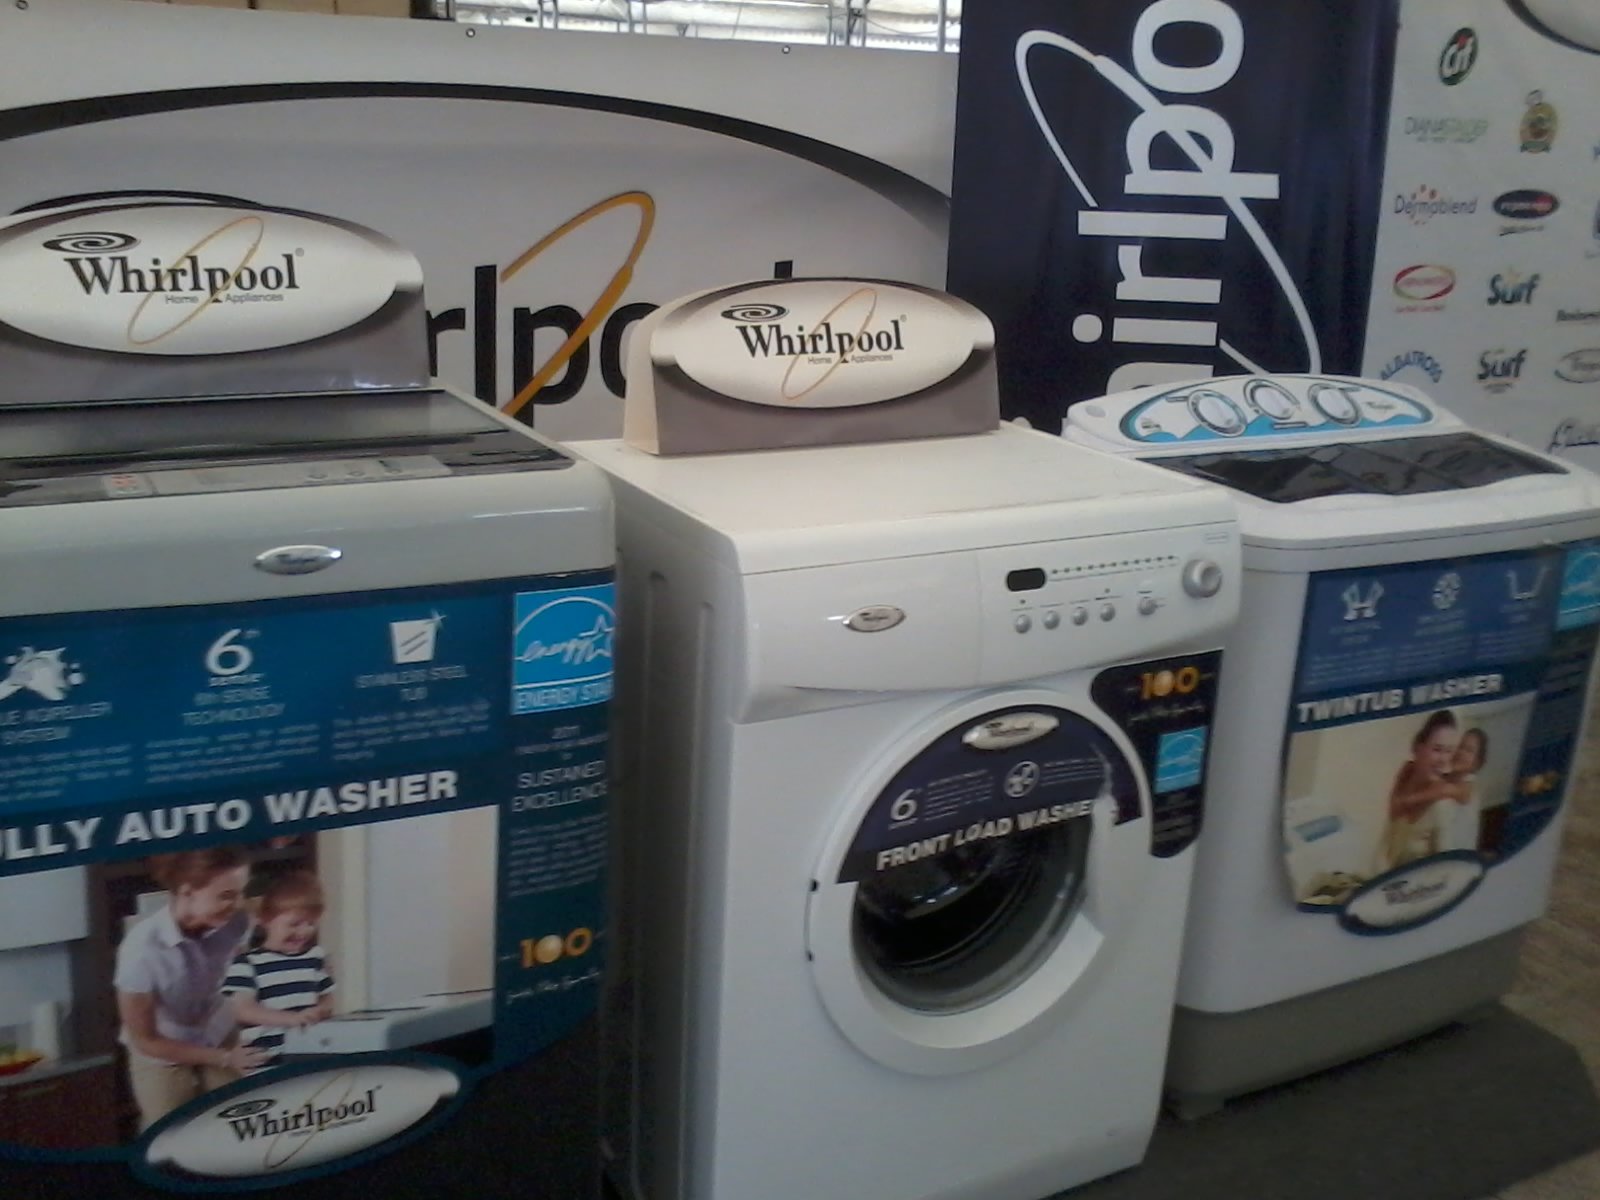 Whirlpool: agreement with Dan Ryan Builders - Home Appliances World